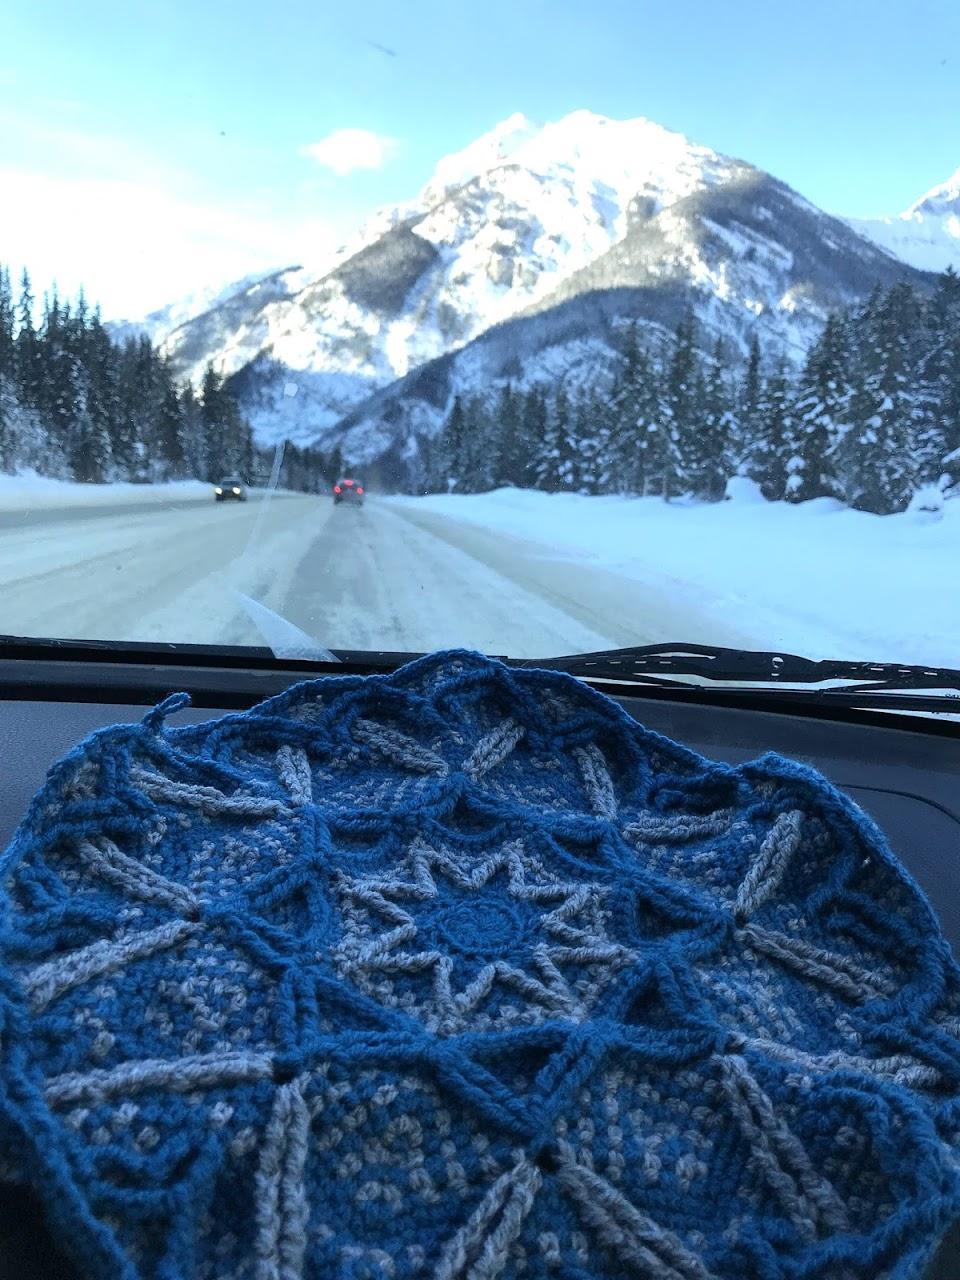 First Snow overlay crochet blanket - pattern on www.lillabjorncrochet.com